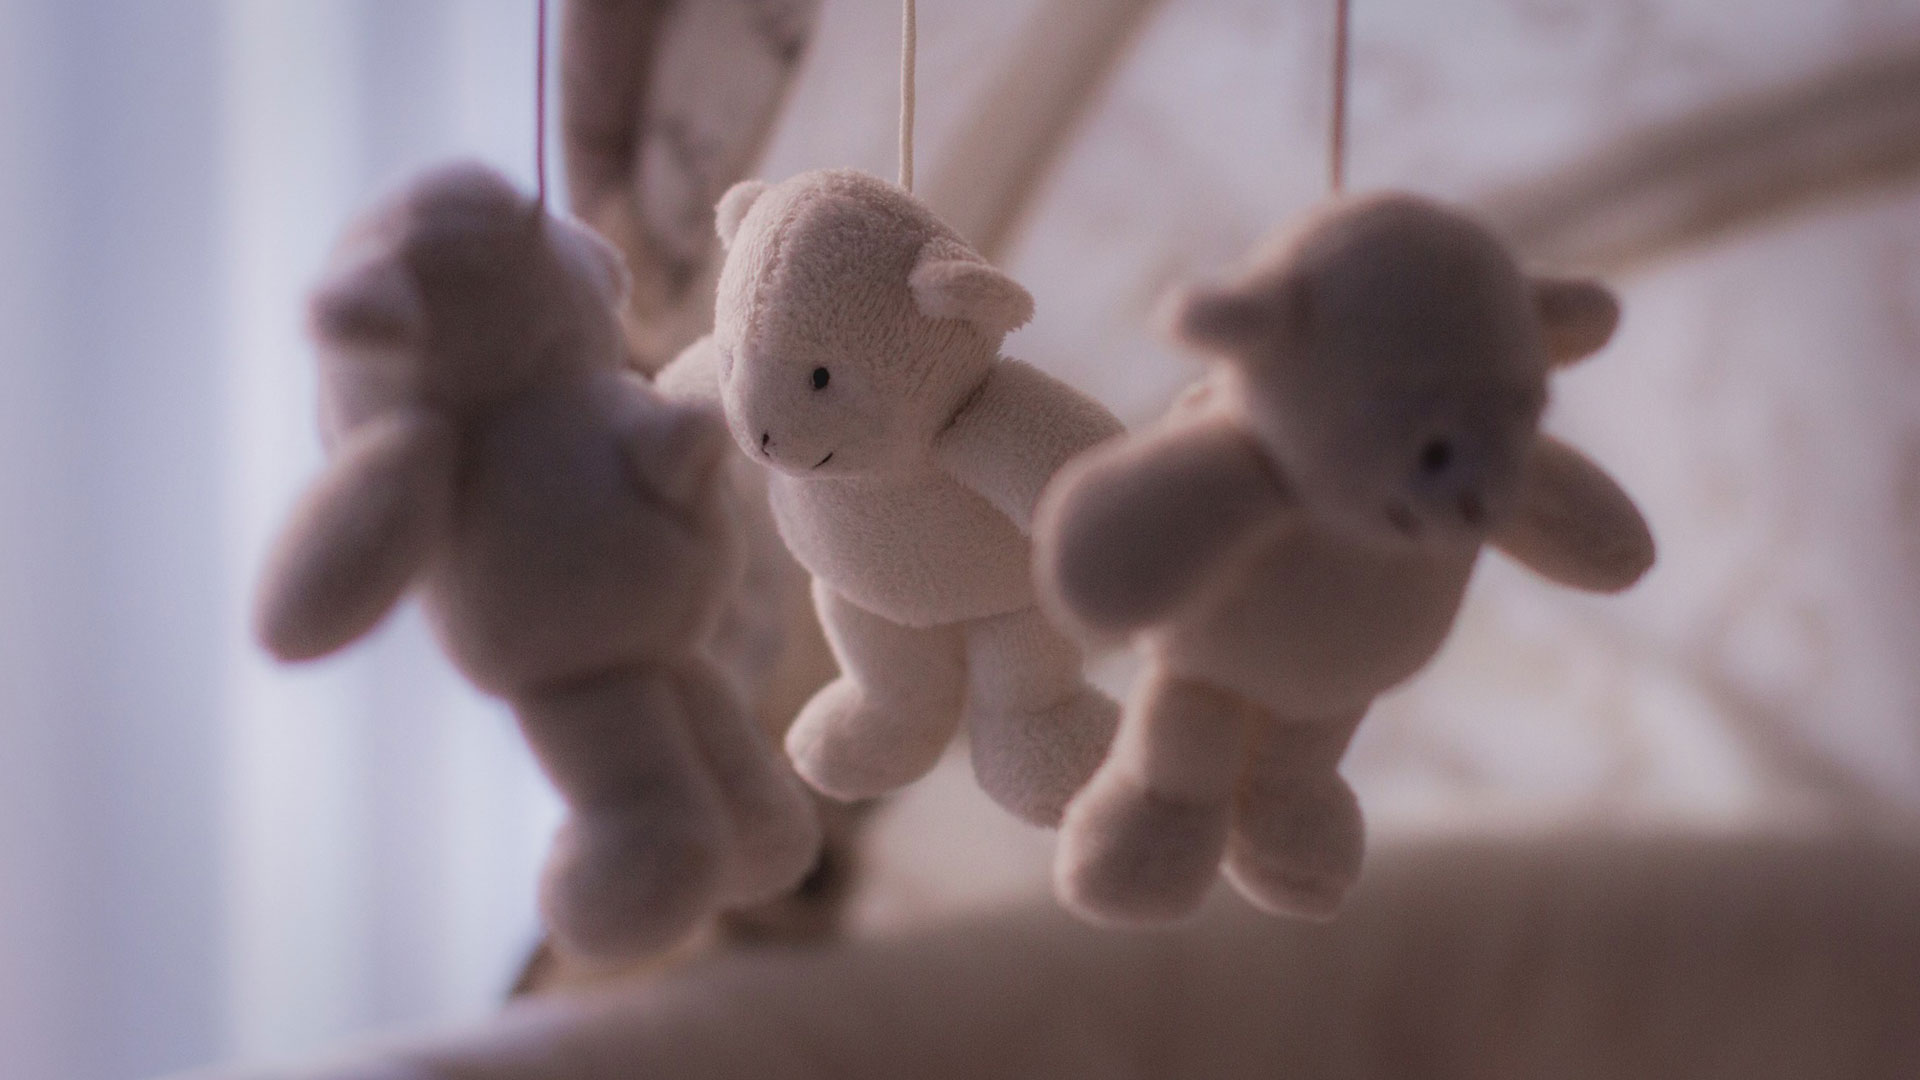 Bären-Mobilé über Kinderbett